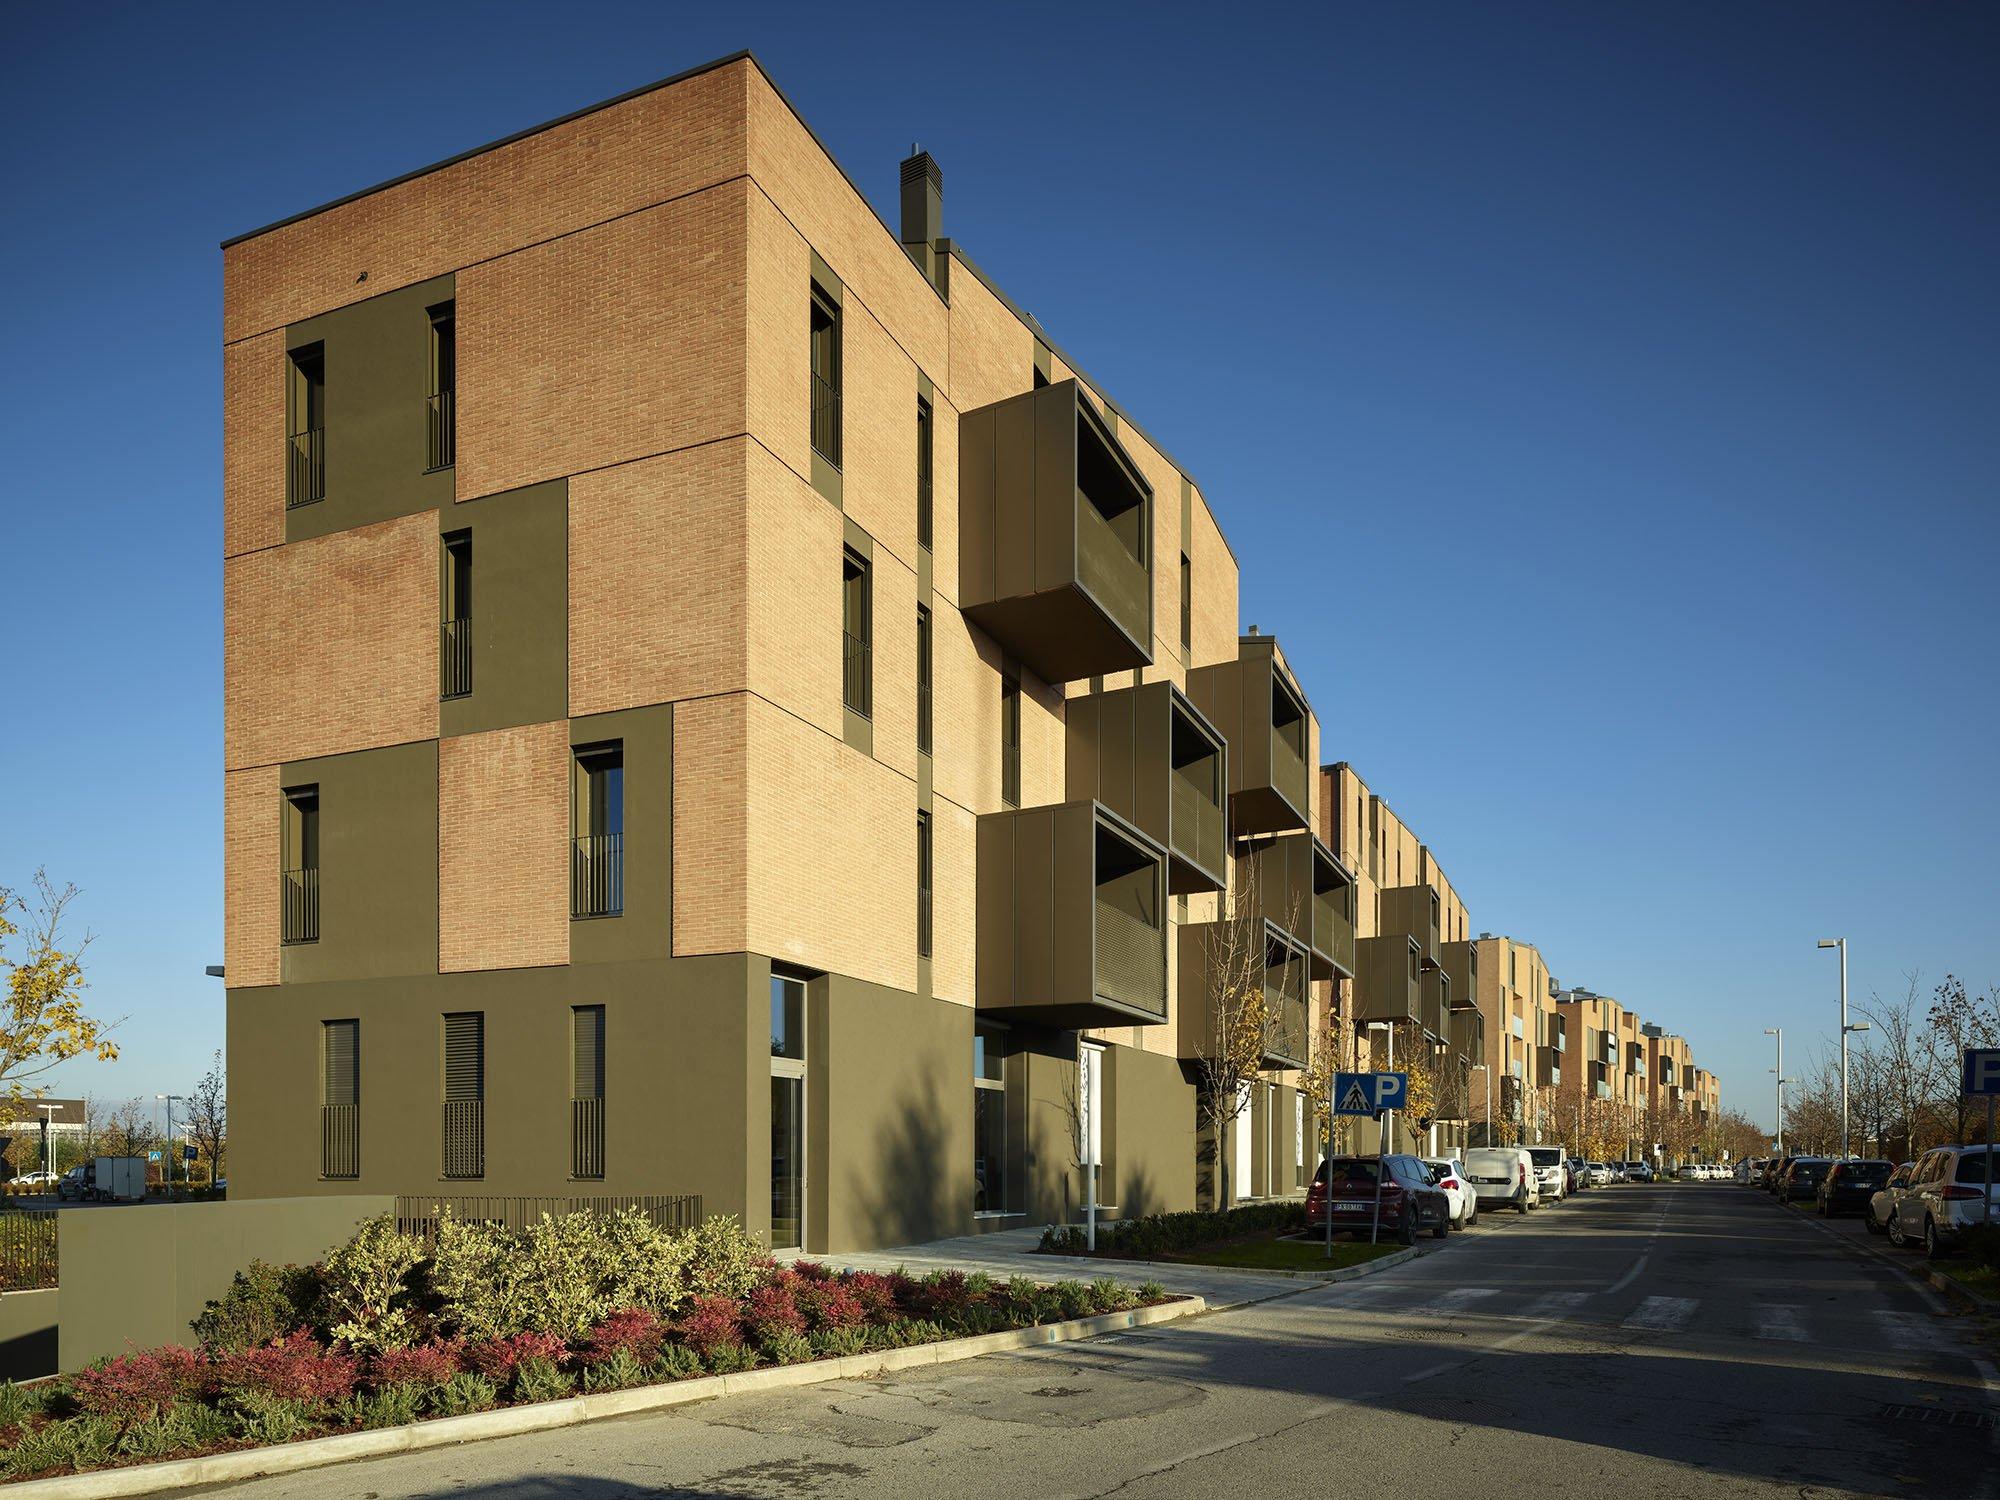 Residenze Area Ex Neri: Faenza gets a new urban backdrop